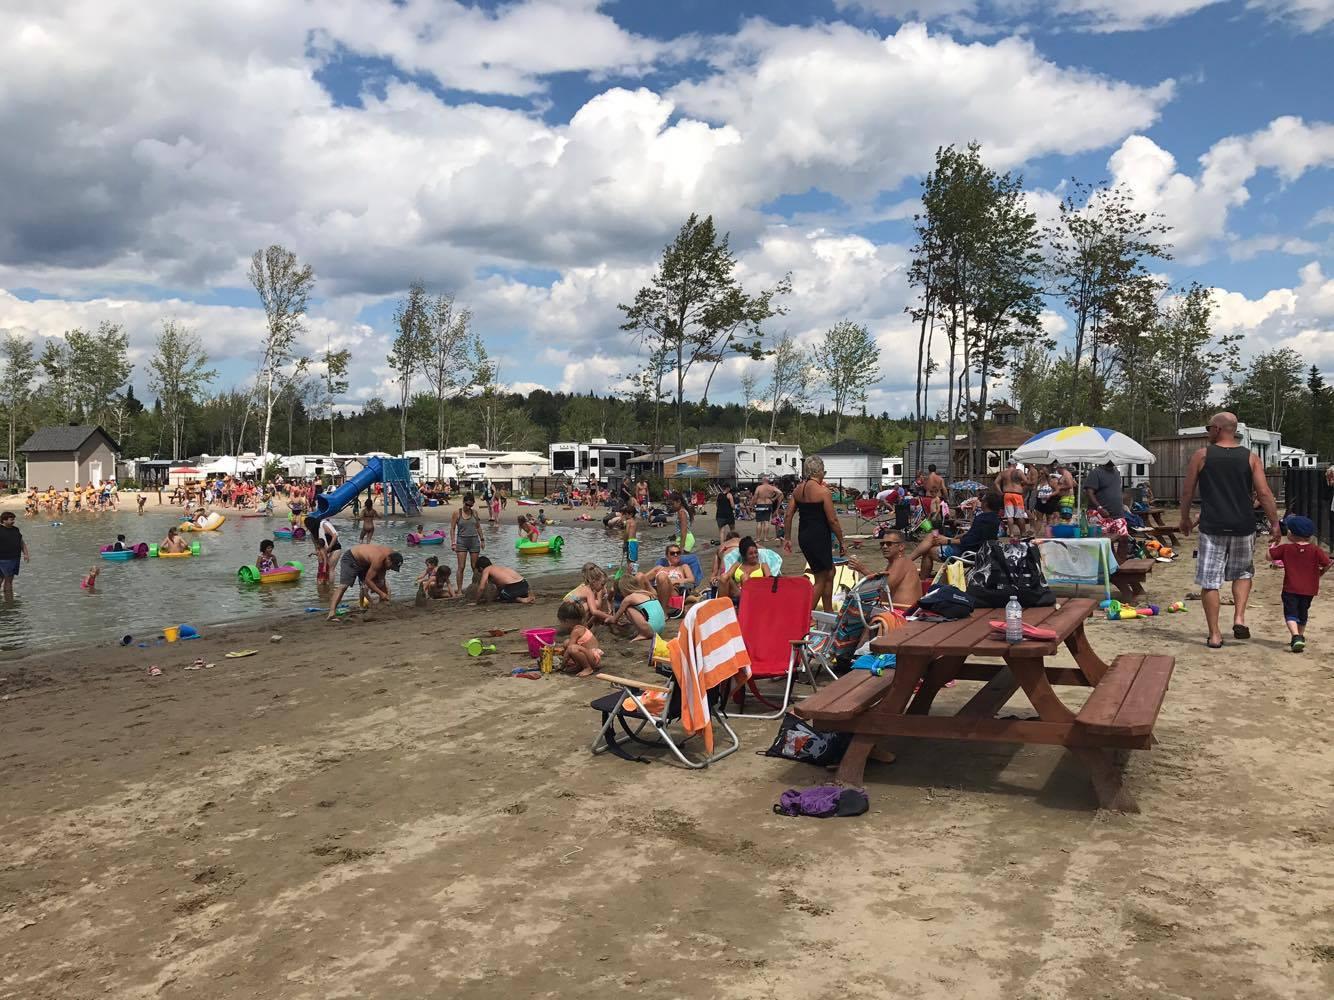 http://www.campingatlantide.com/wp-content/uploads/2018/01/beach-party-2017-complexe-atlantide-15.jpg